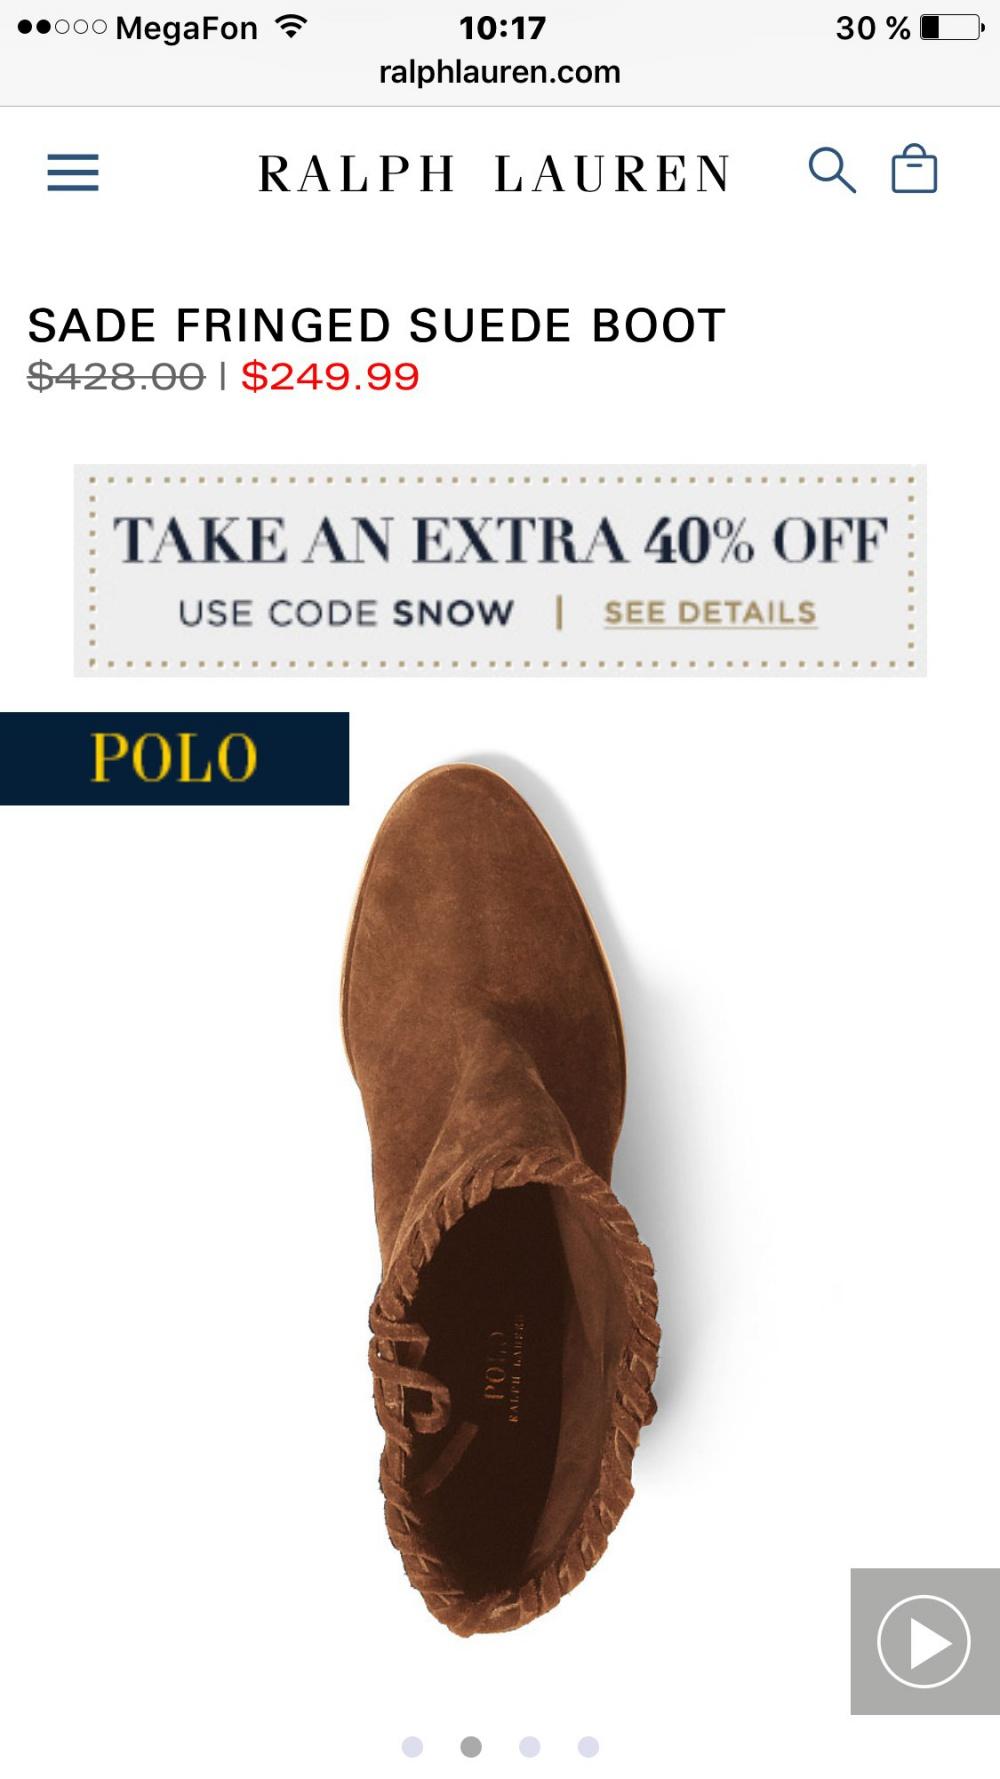 Ботильоны Polo Ralph Lauren размер 40